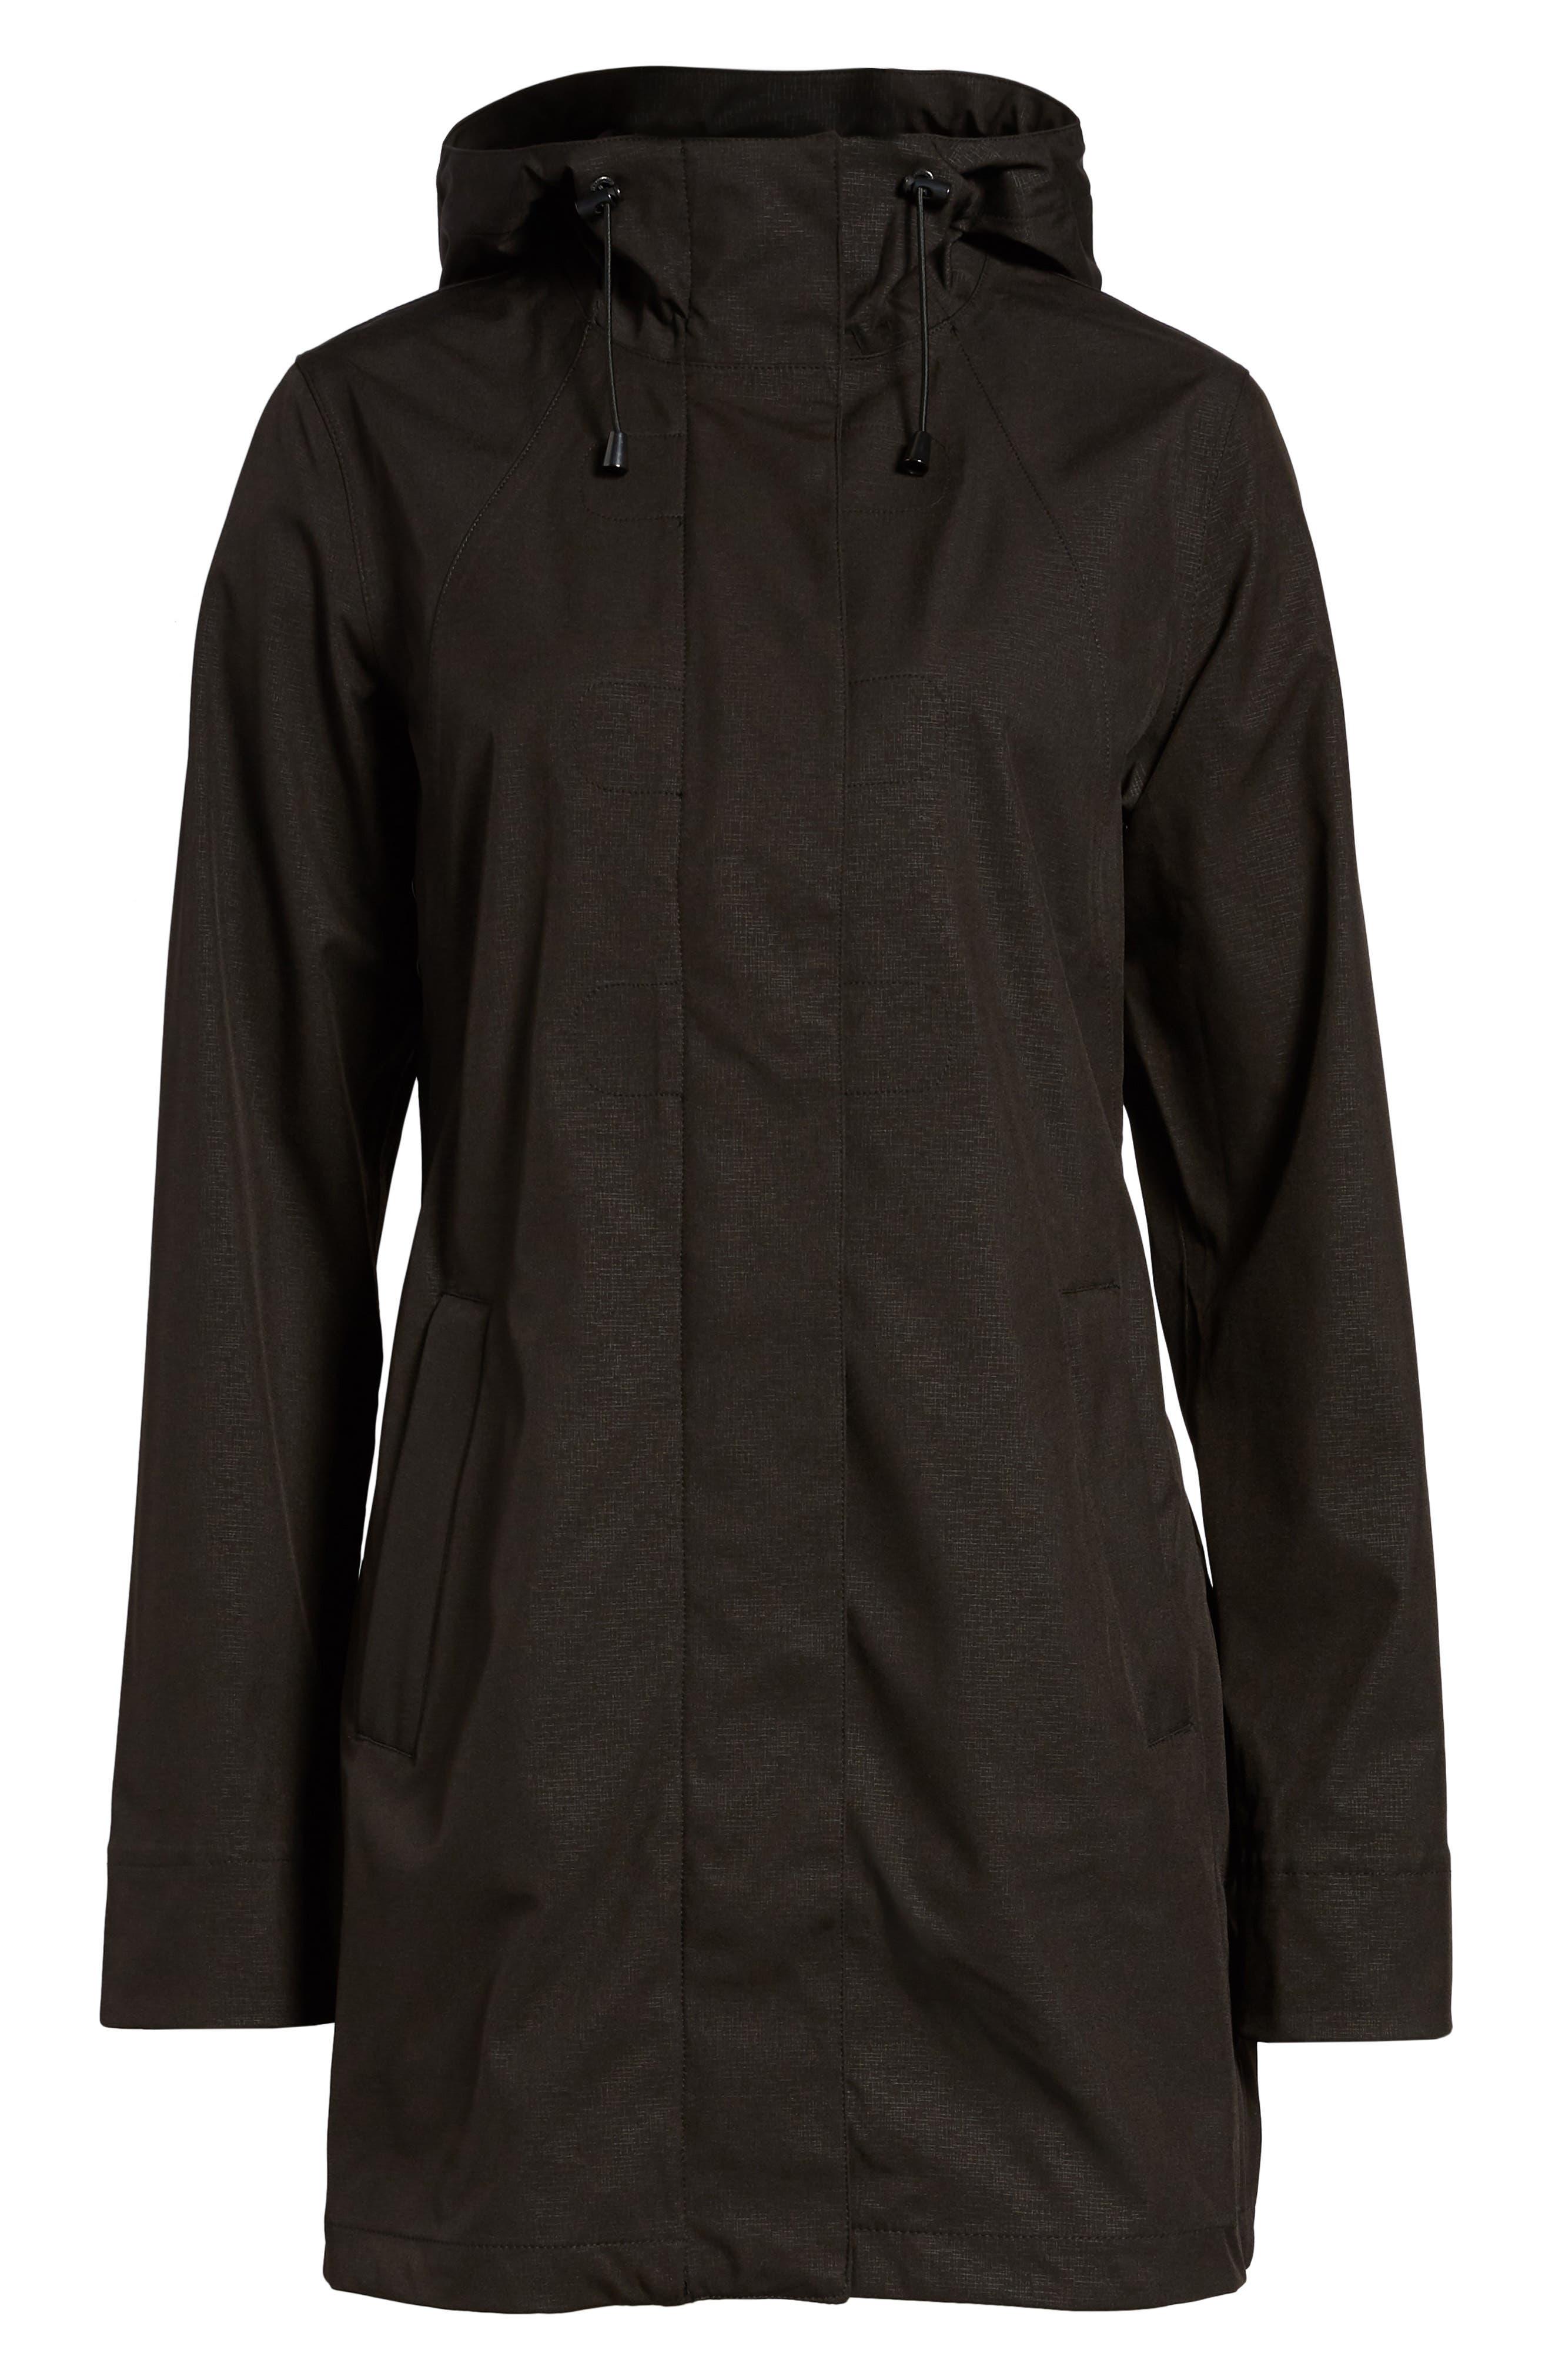 Soft Shell Raincoat,                             Main thumbnail 1, color,                             Black